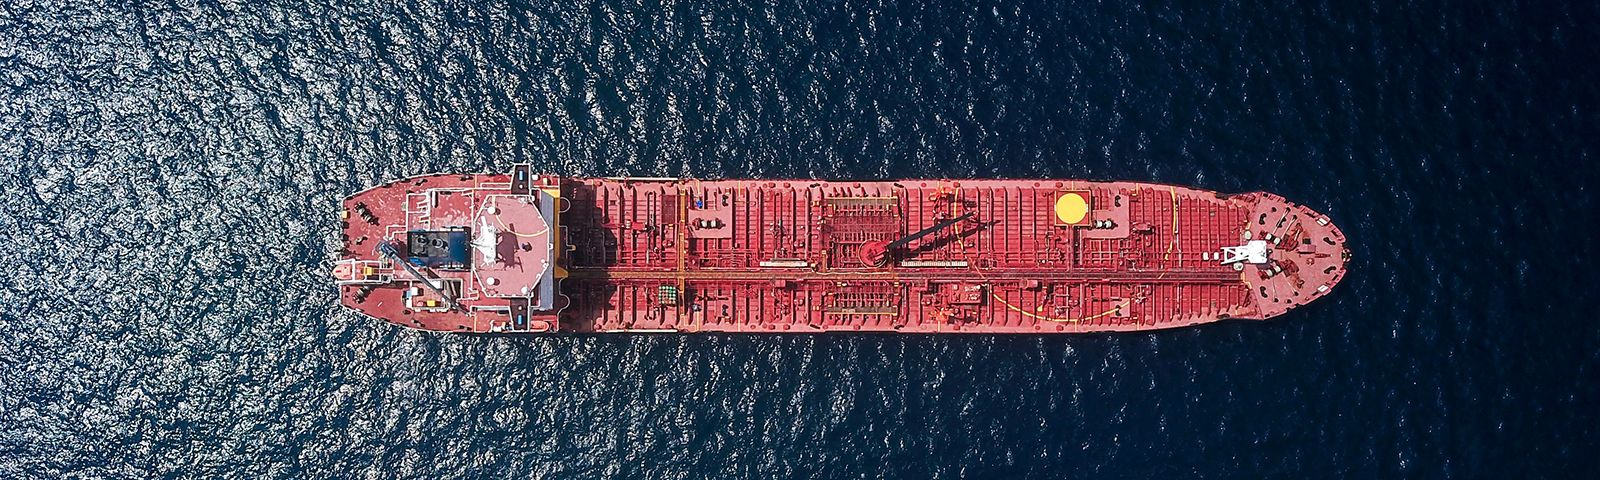 Shipping faces uncertain route to zero-carbon future